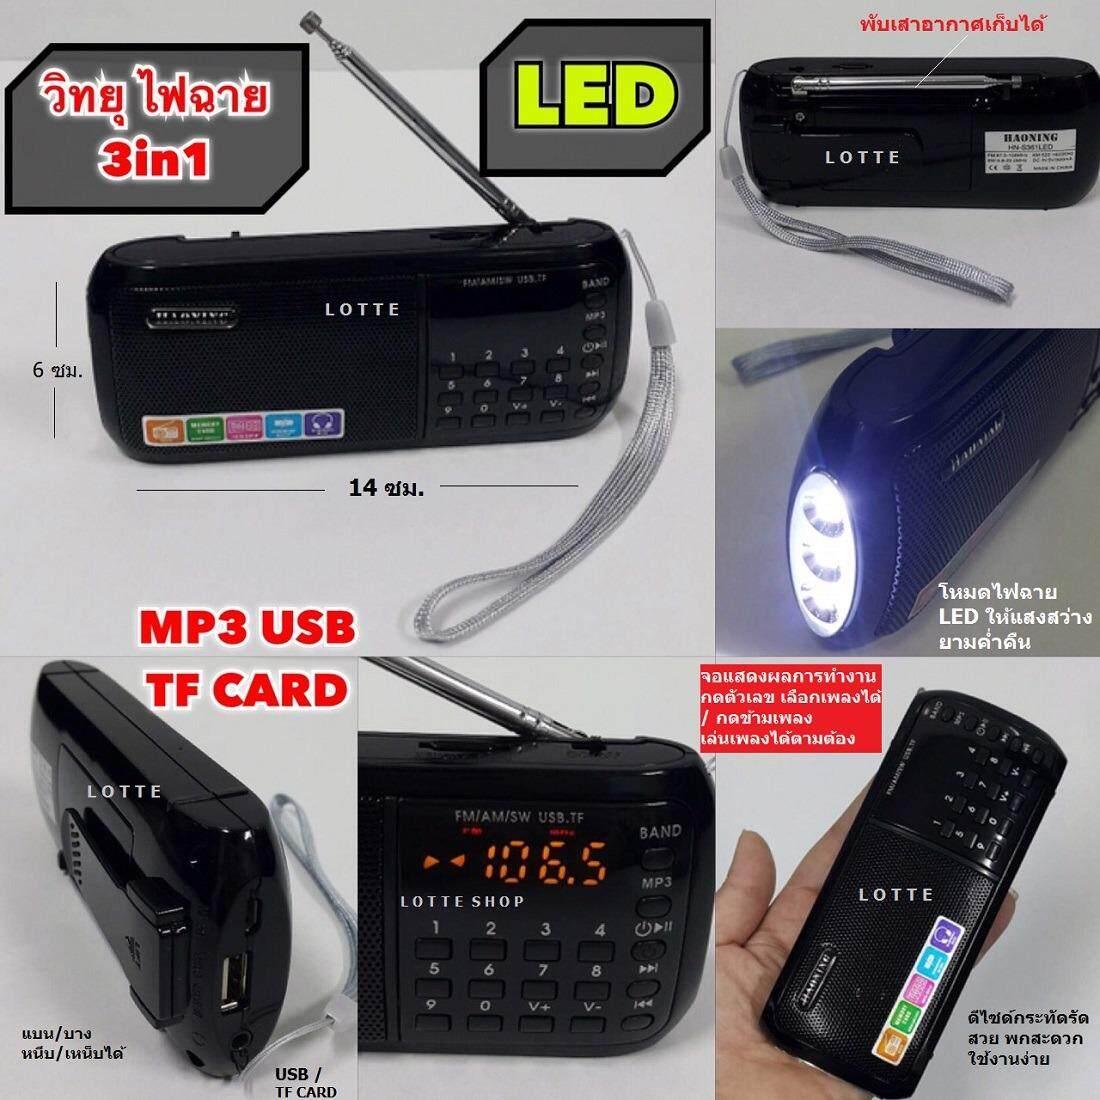 Hn 3in1 วิทยุ ไฟฉาย + ช่องเล่นเพลง Usb Tf Card มีเสาอากาศ พร้อมจอ แสดงตัวเลข เลือกเพลงได้ ฯ ชาร์จได้ Multi-Radio Player (สีดำ) By Lotte Shop.